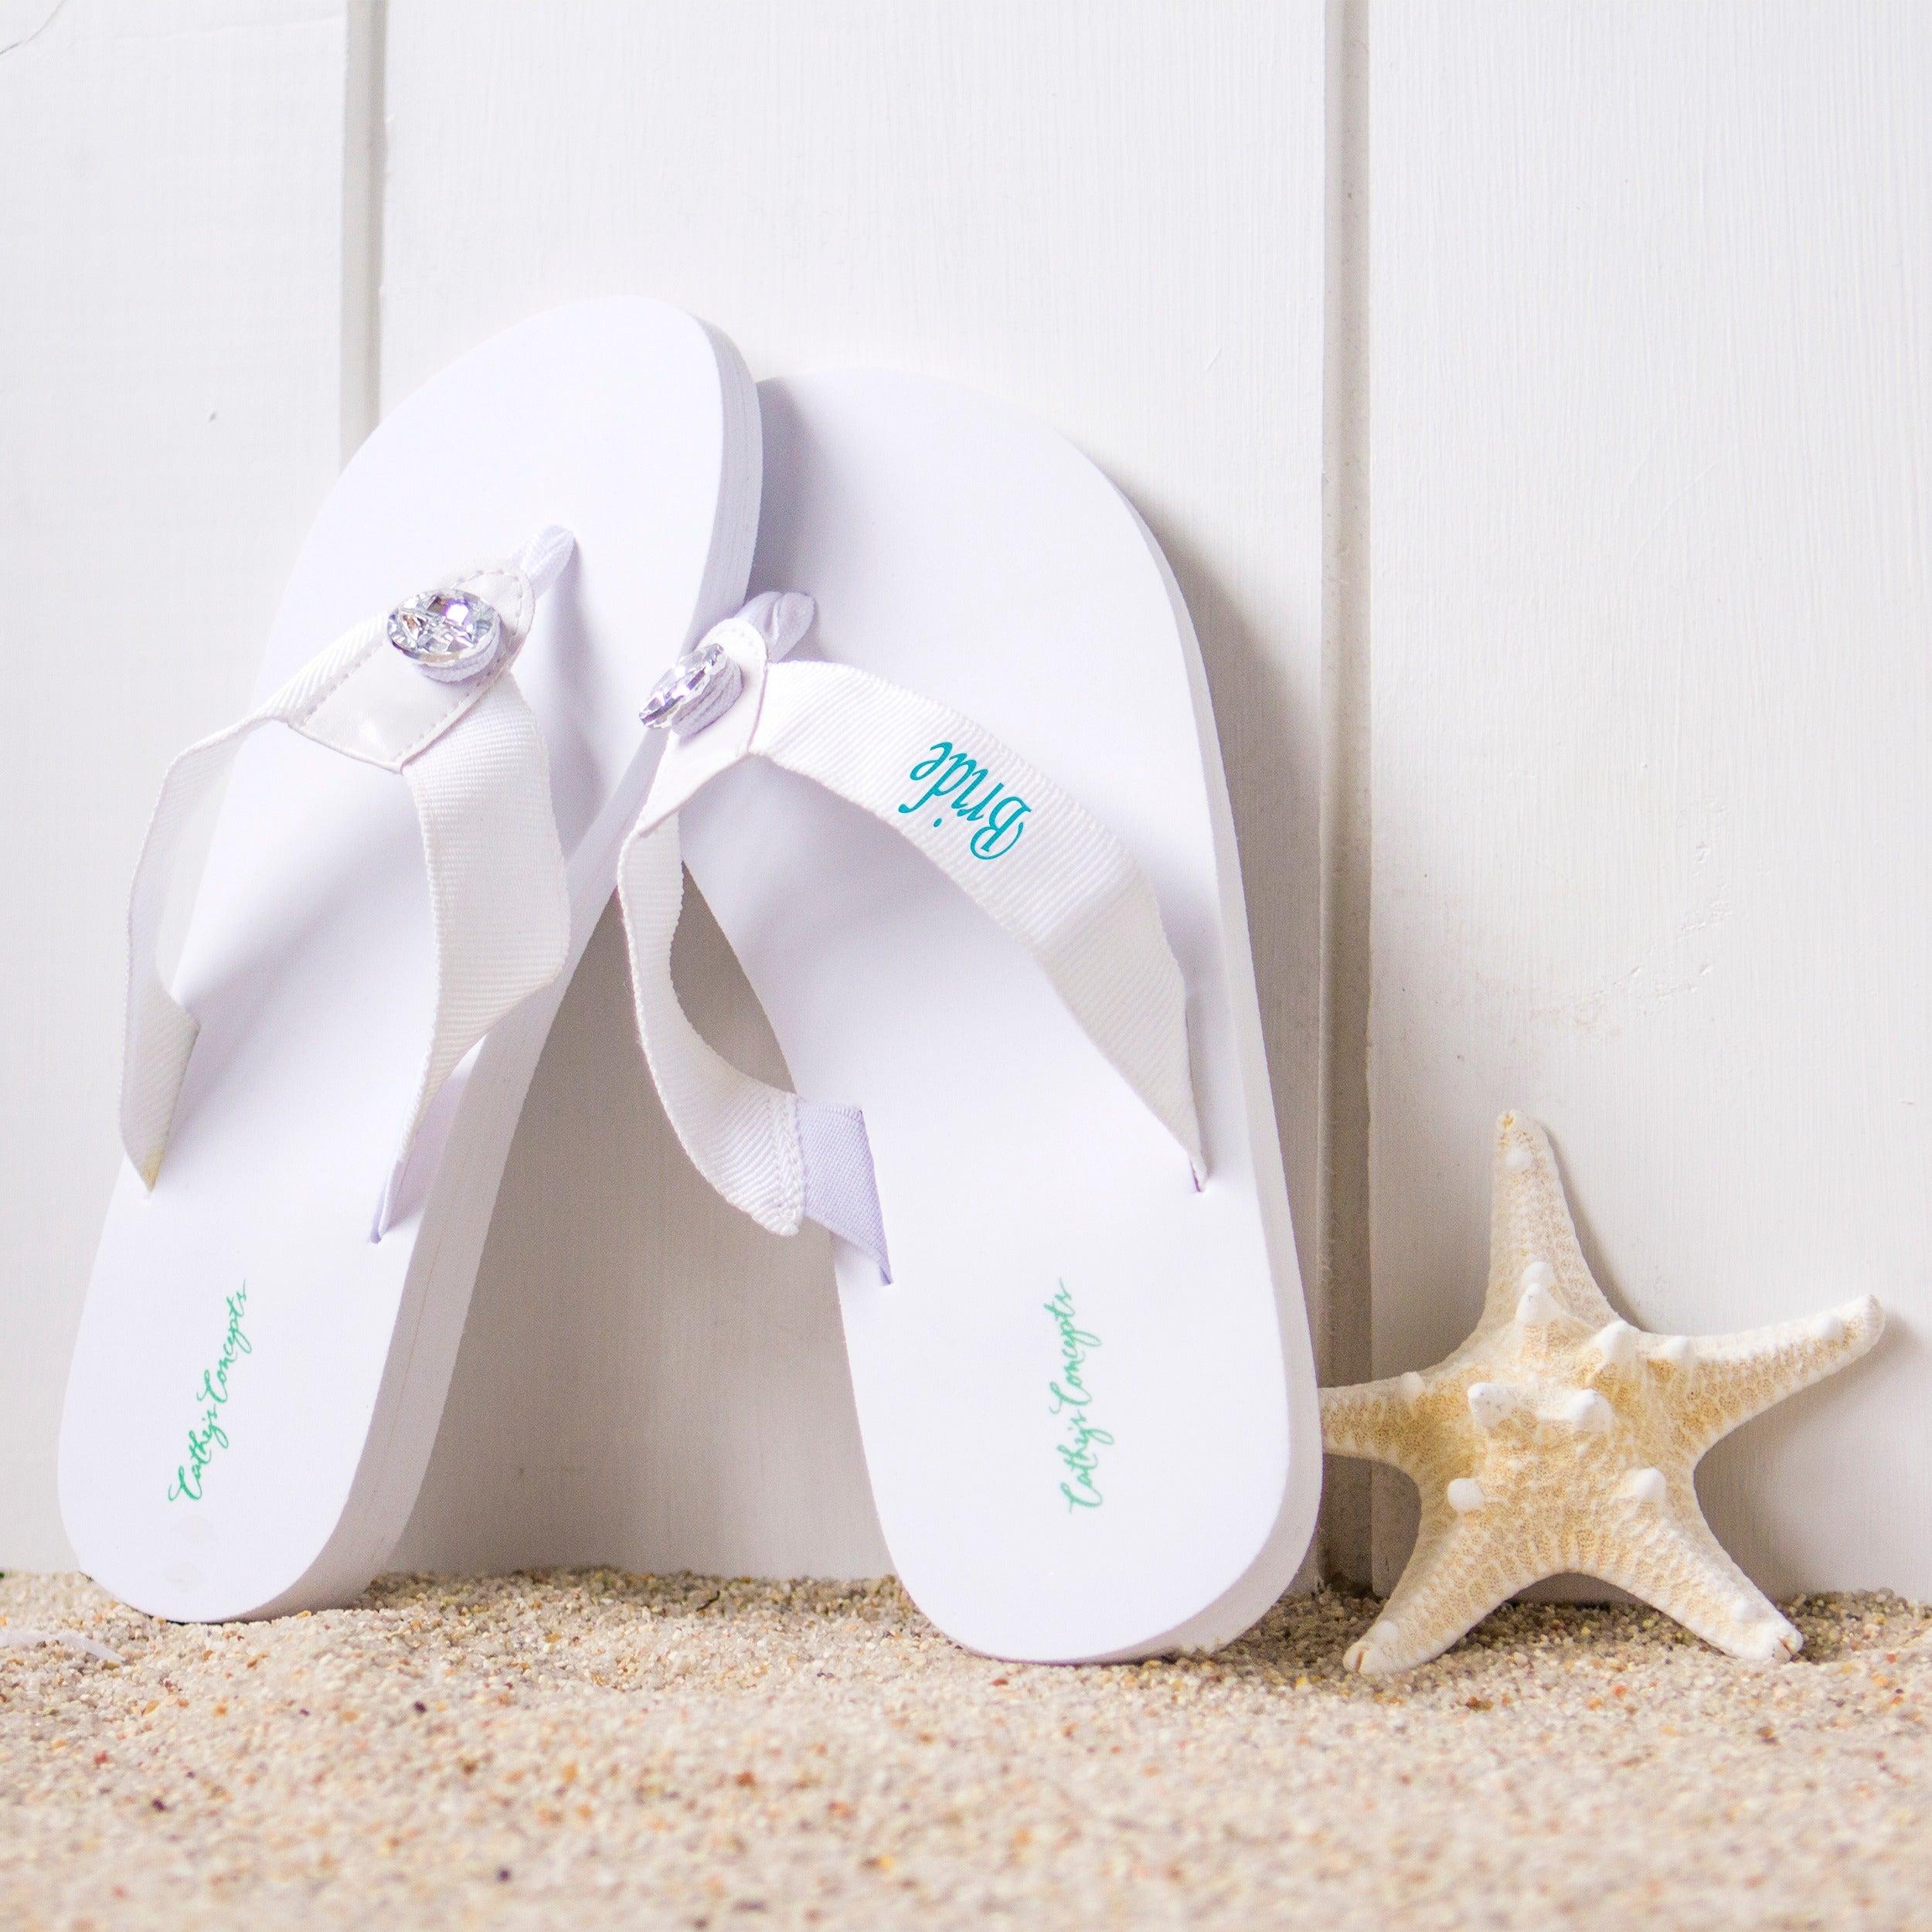 Shop Bride White Wedding Flip Flops Overstock 6590404